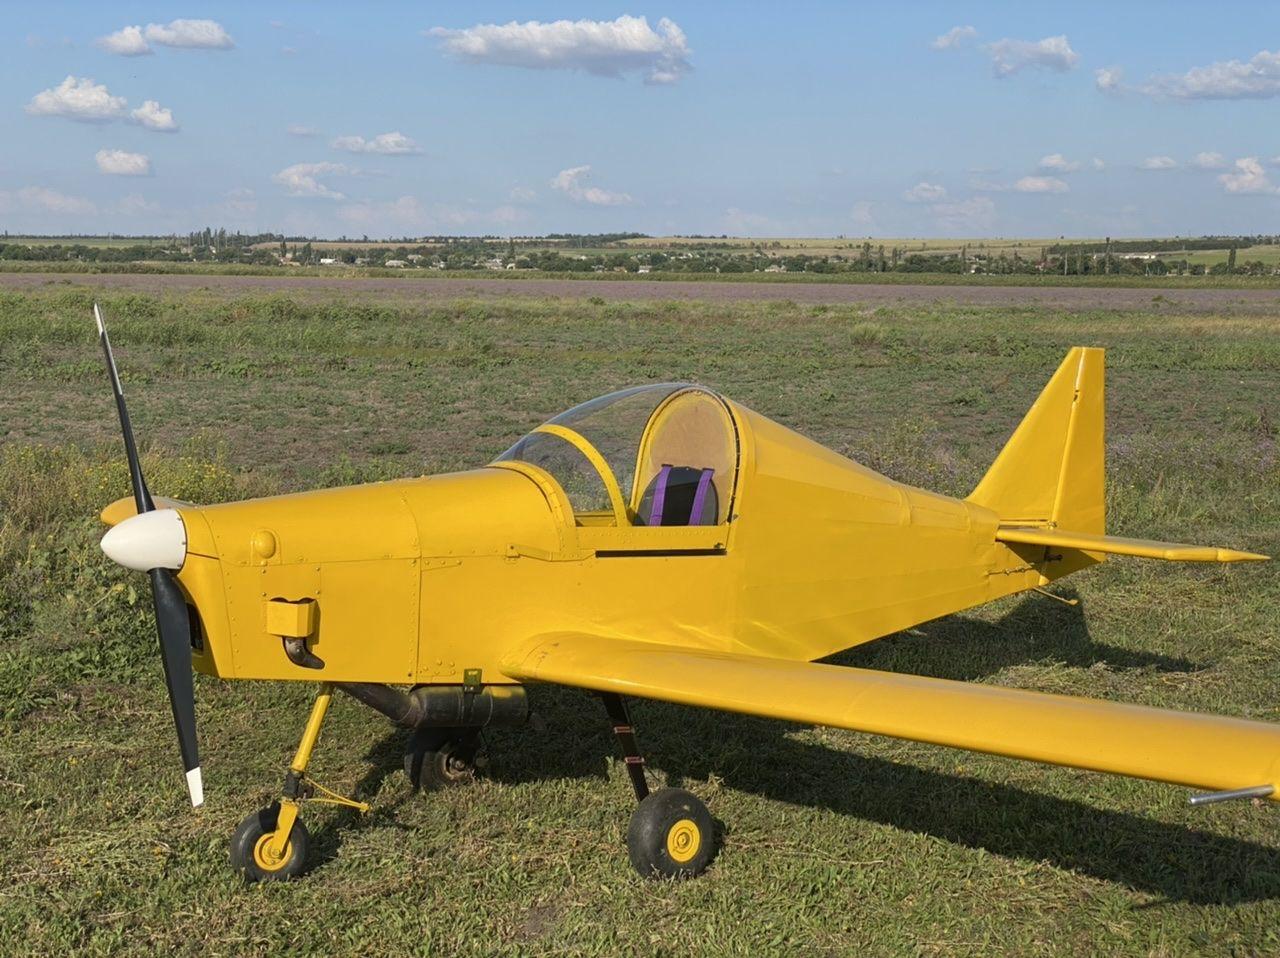 AB8DC0AC-1EFB-4D83-BF44-D0952A7FF7F4.jpeg